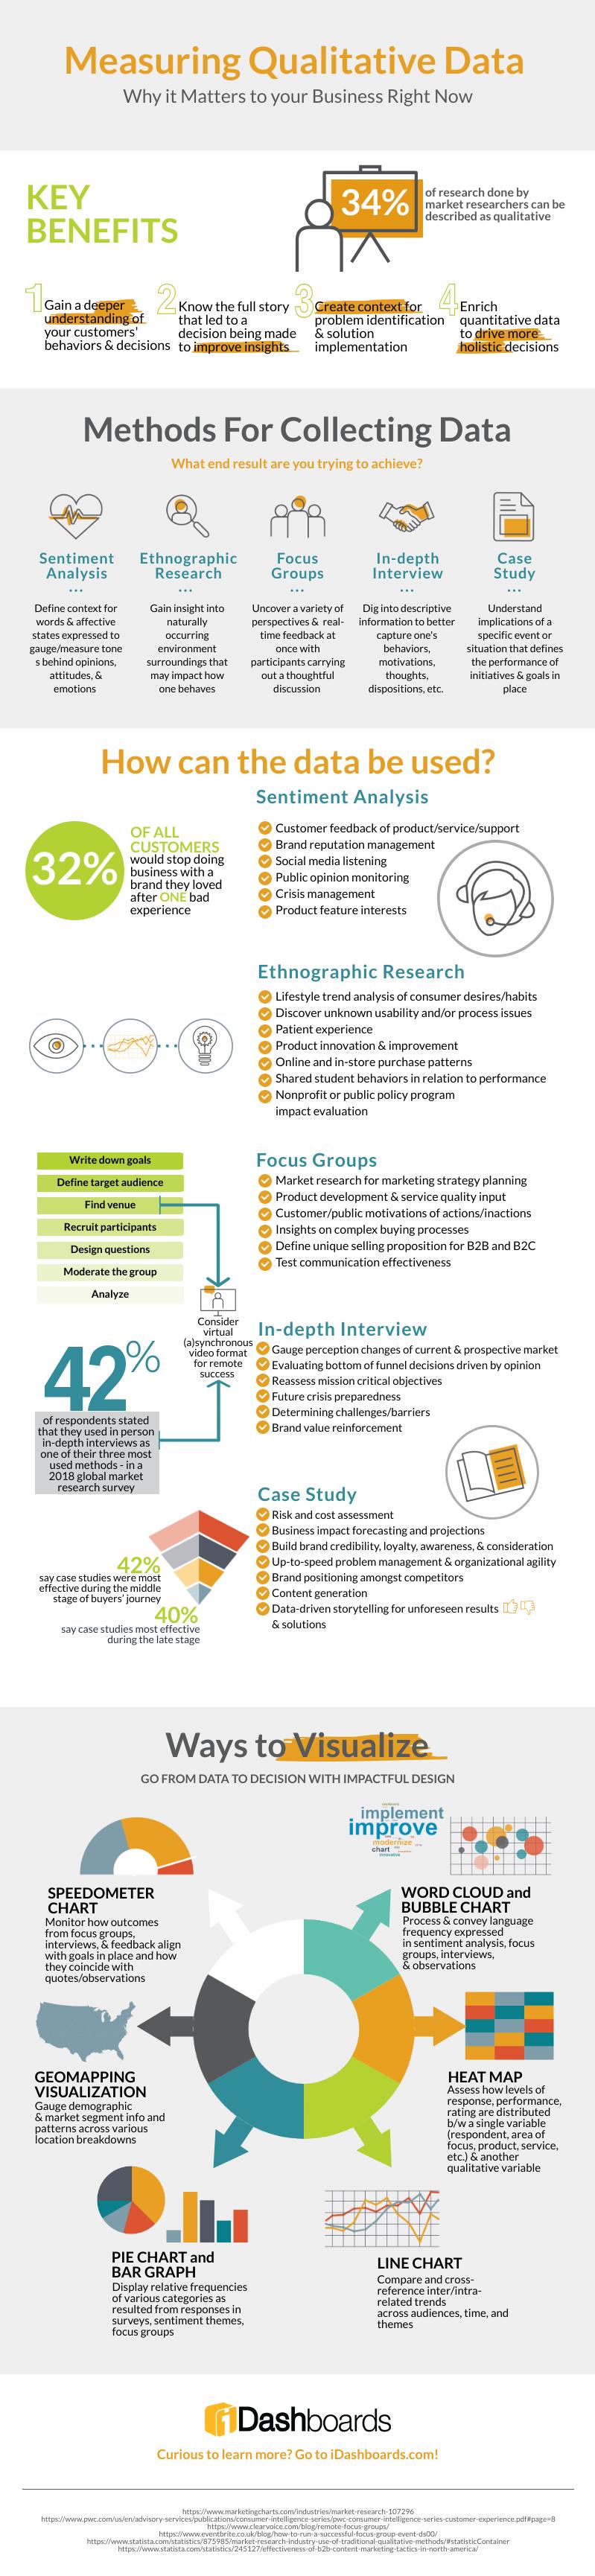 Measuring Qualitative Data #infographic